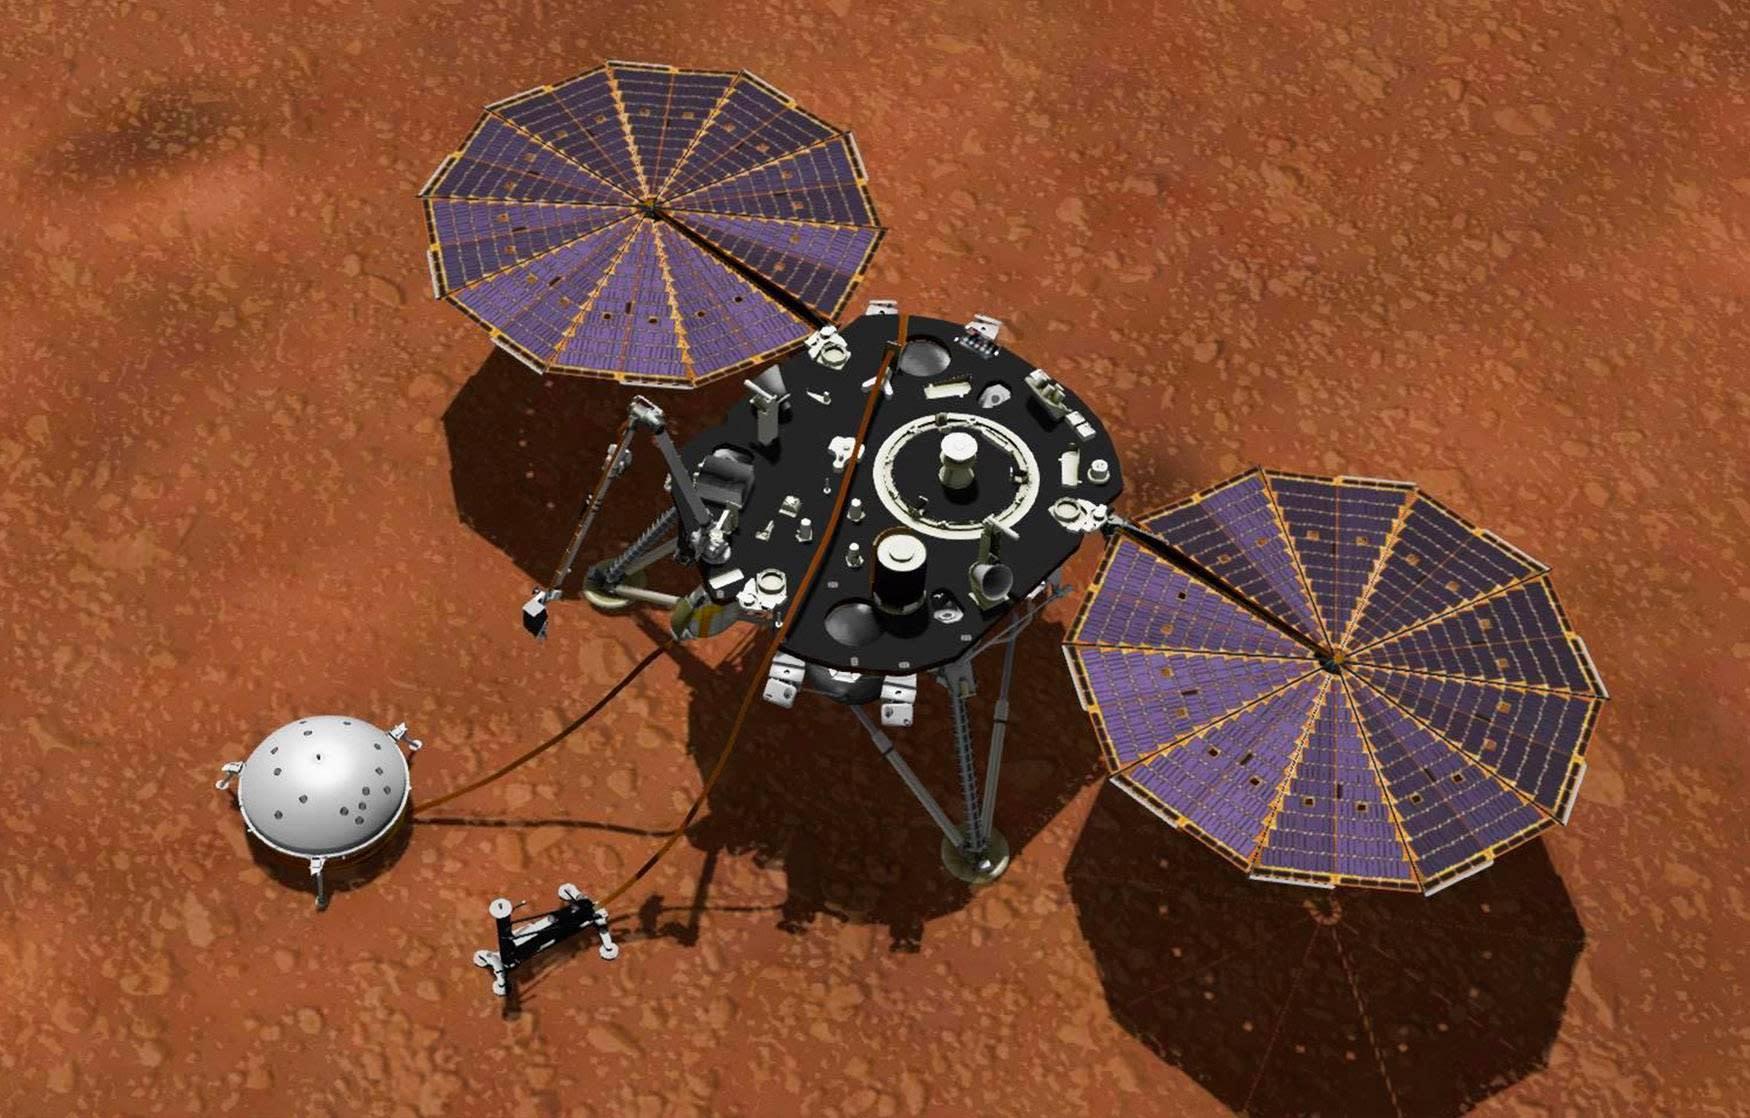 NASA's InSight Mars lander dumped dirt on itself on purpose – Yahoo Entertainment